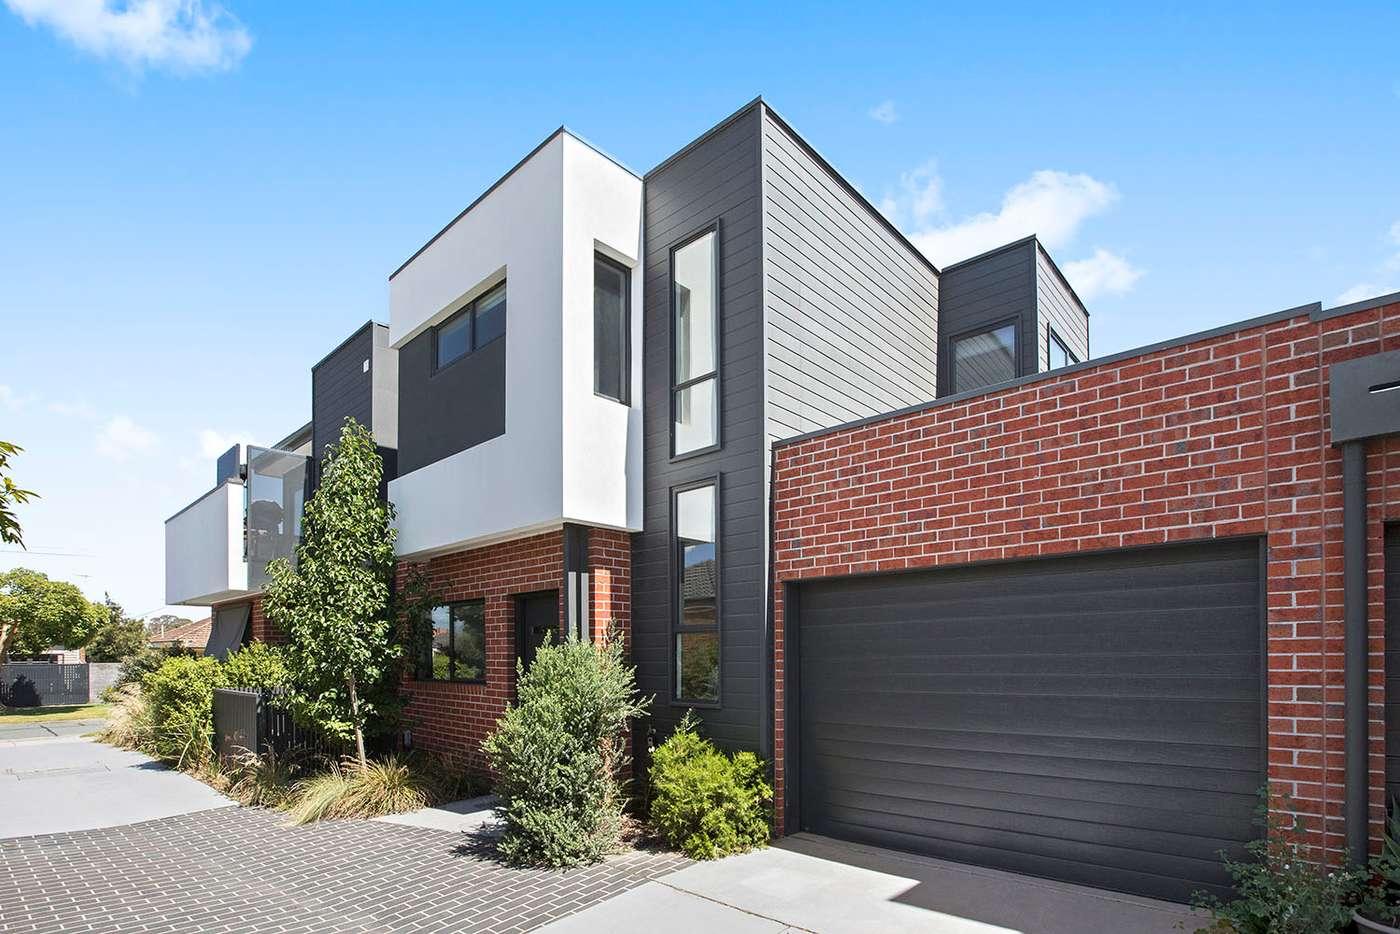 Main view of Homely unit listing, 2/93 Flinders Street, Mentone VIC 3194